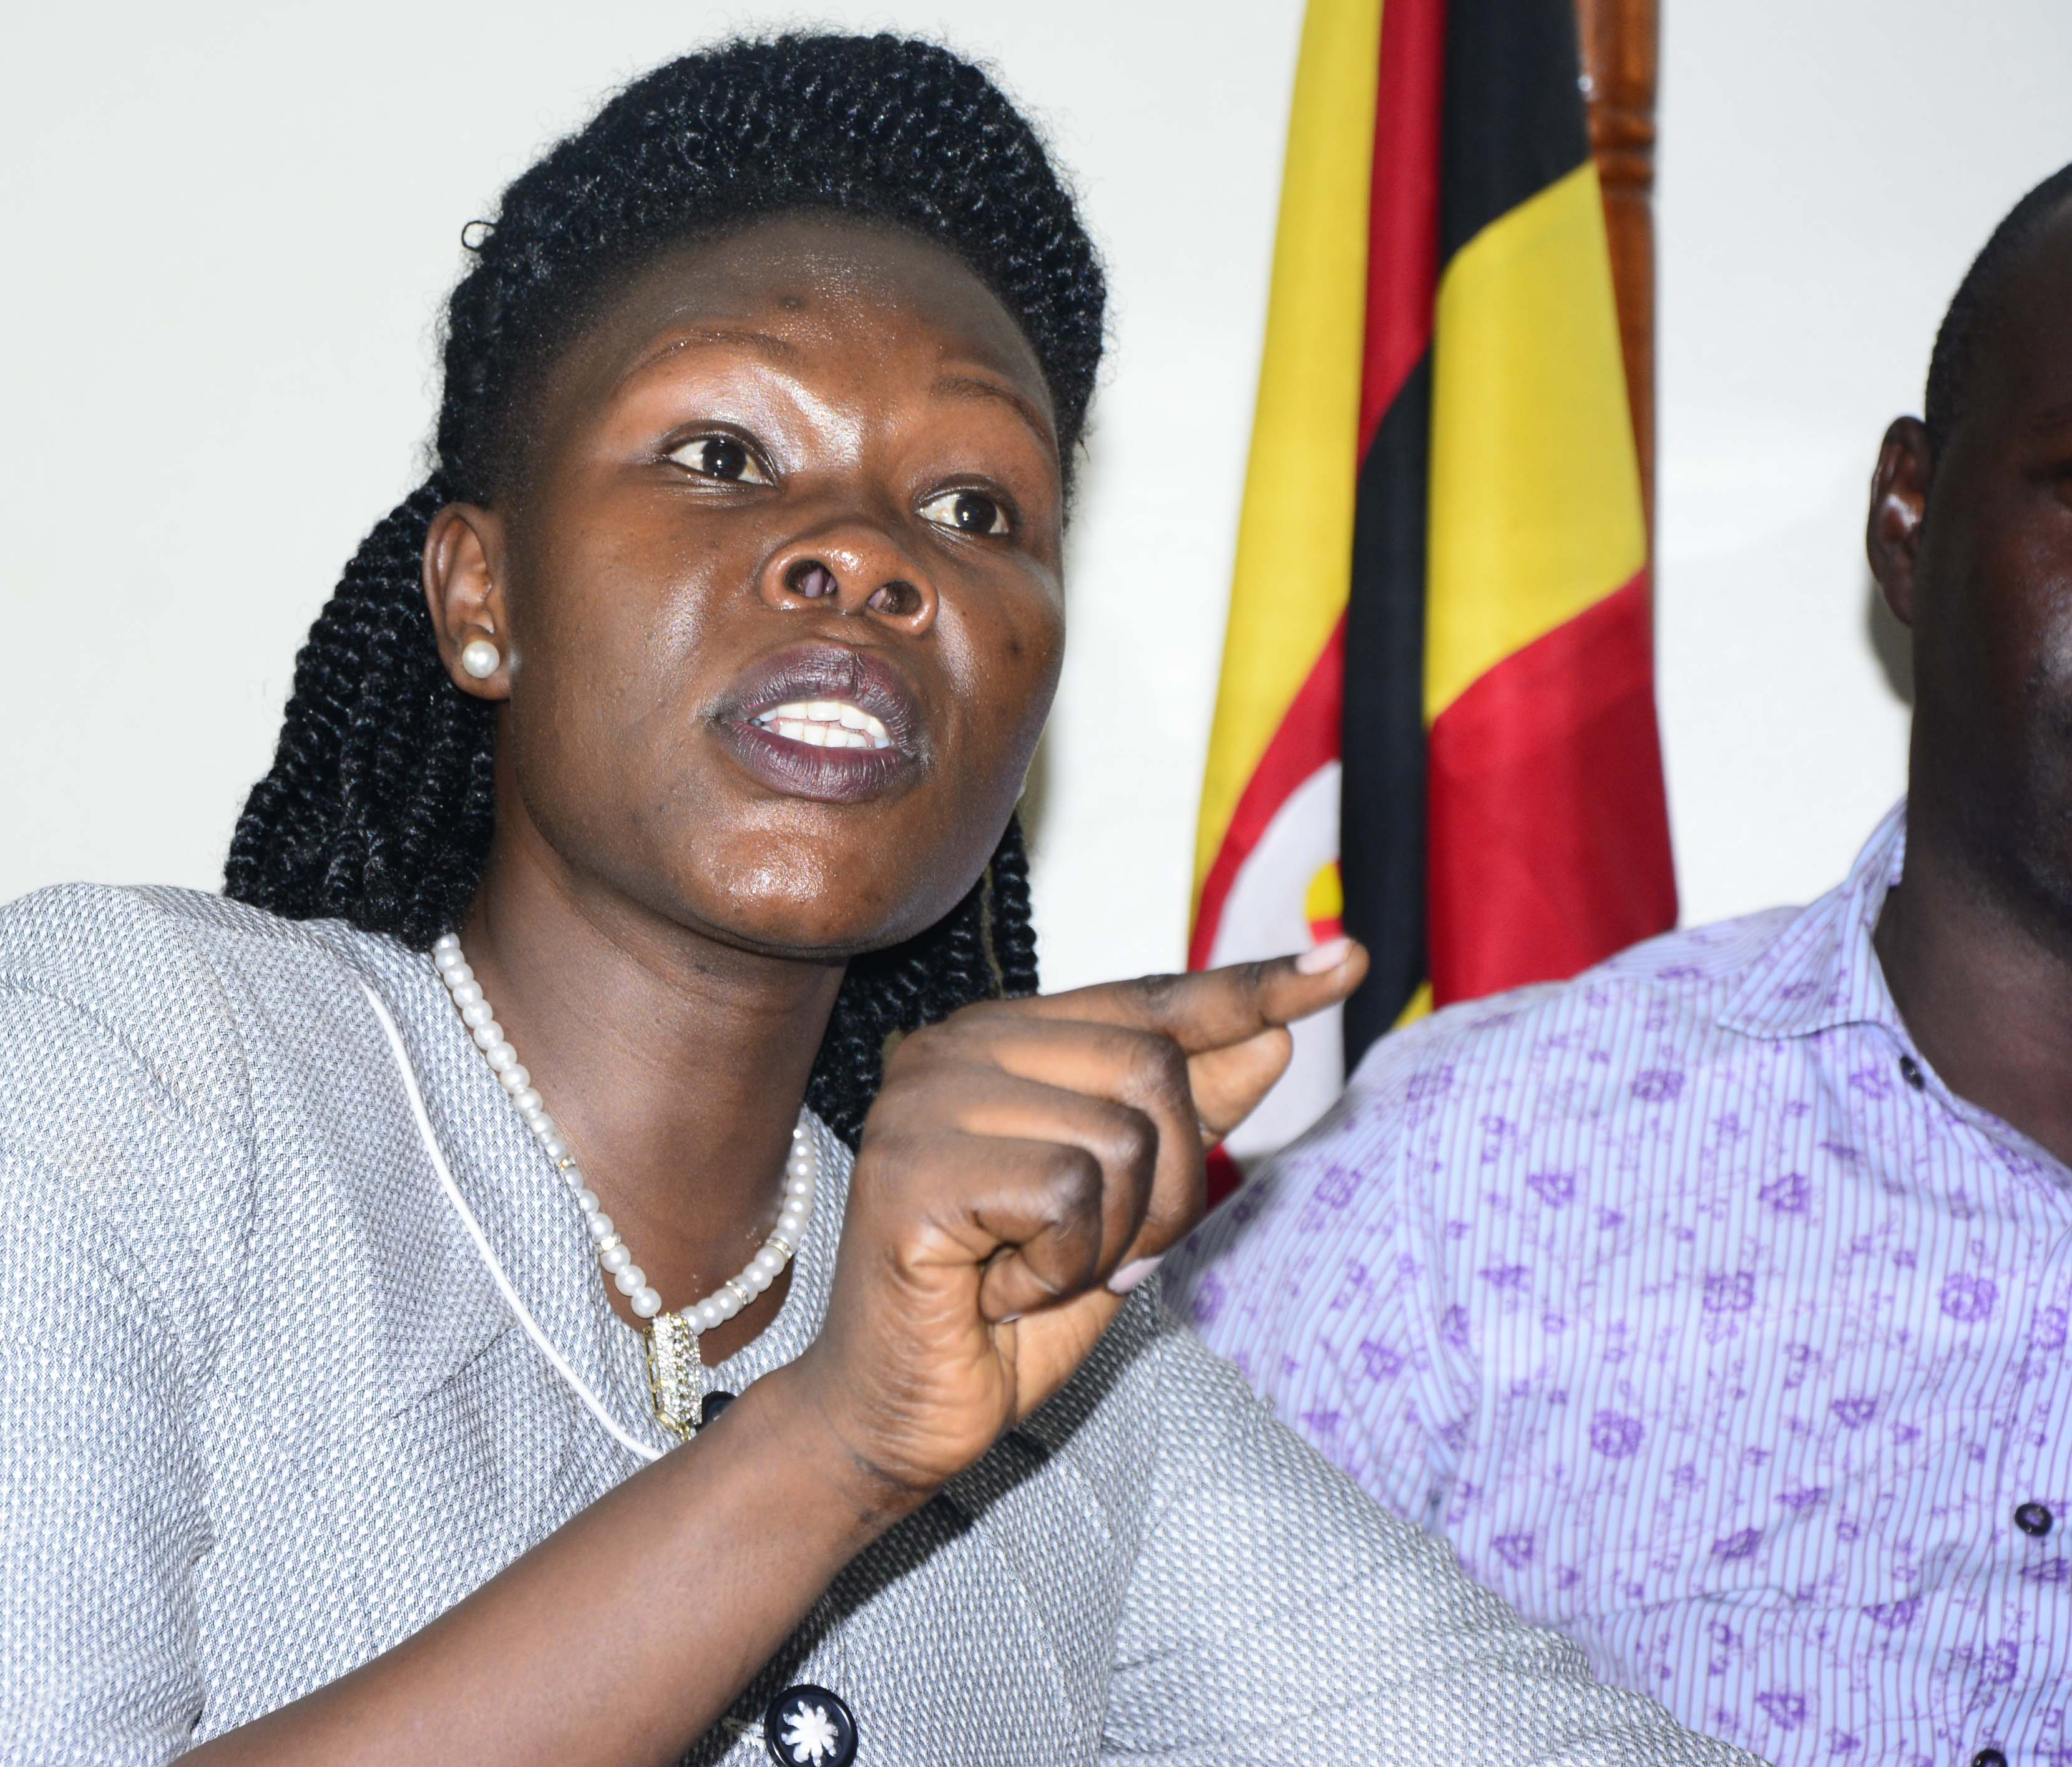 Minister Anite has fired at Deputy Attorney General Mwesigwa Rukutana. (PHOTO/File)